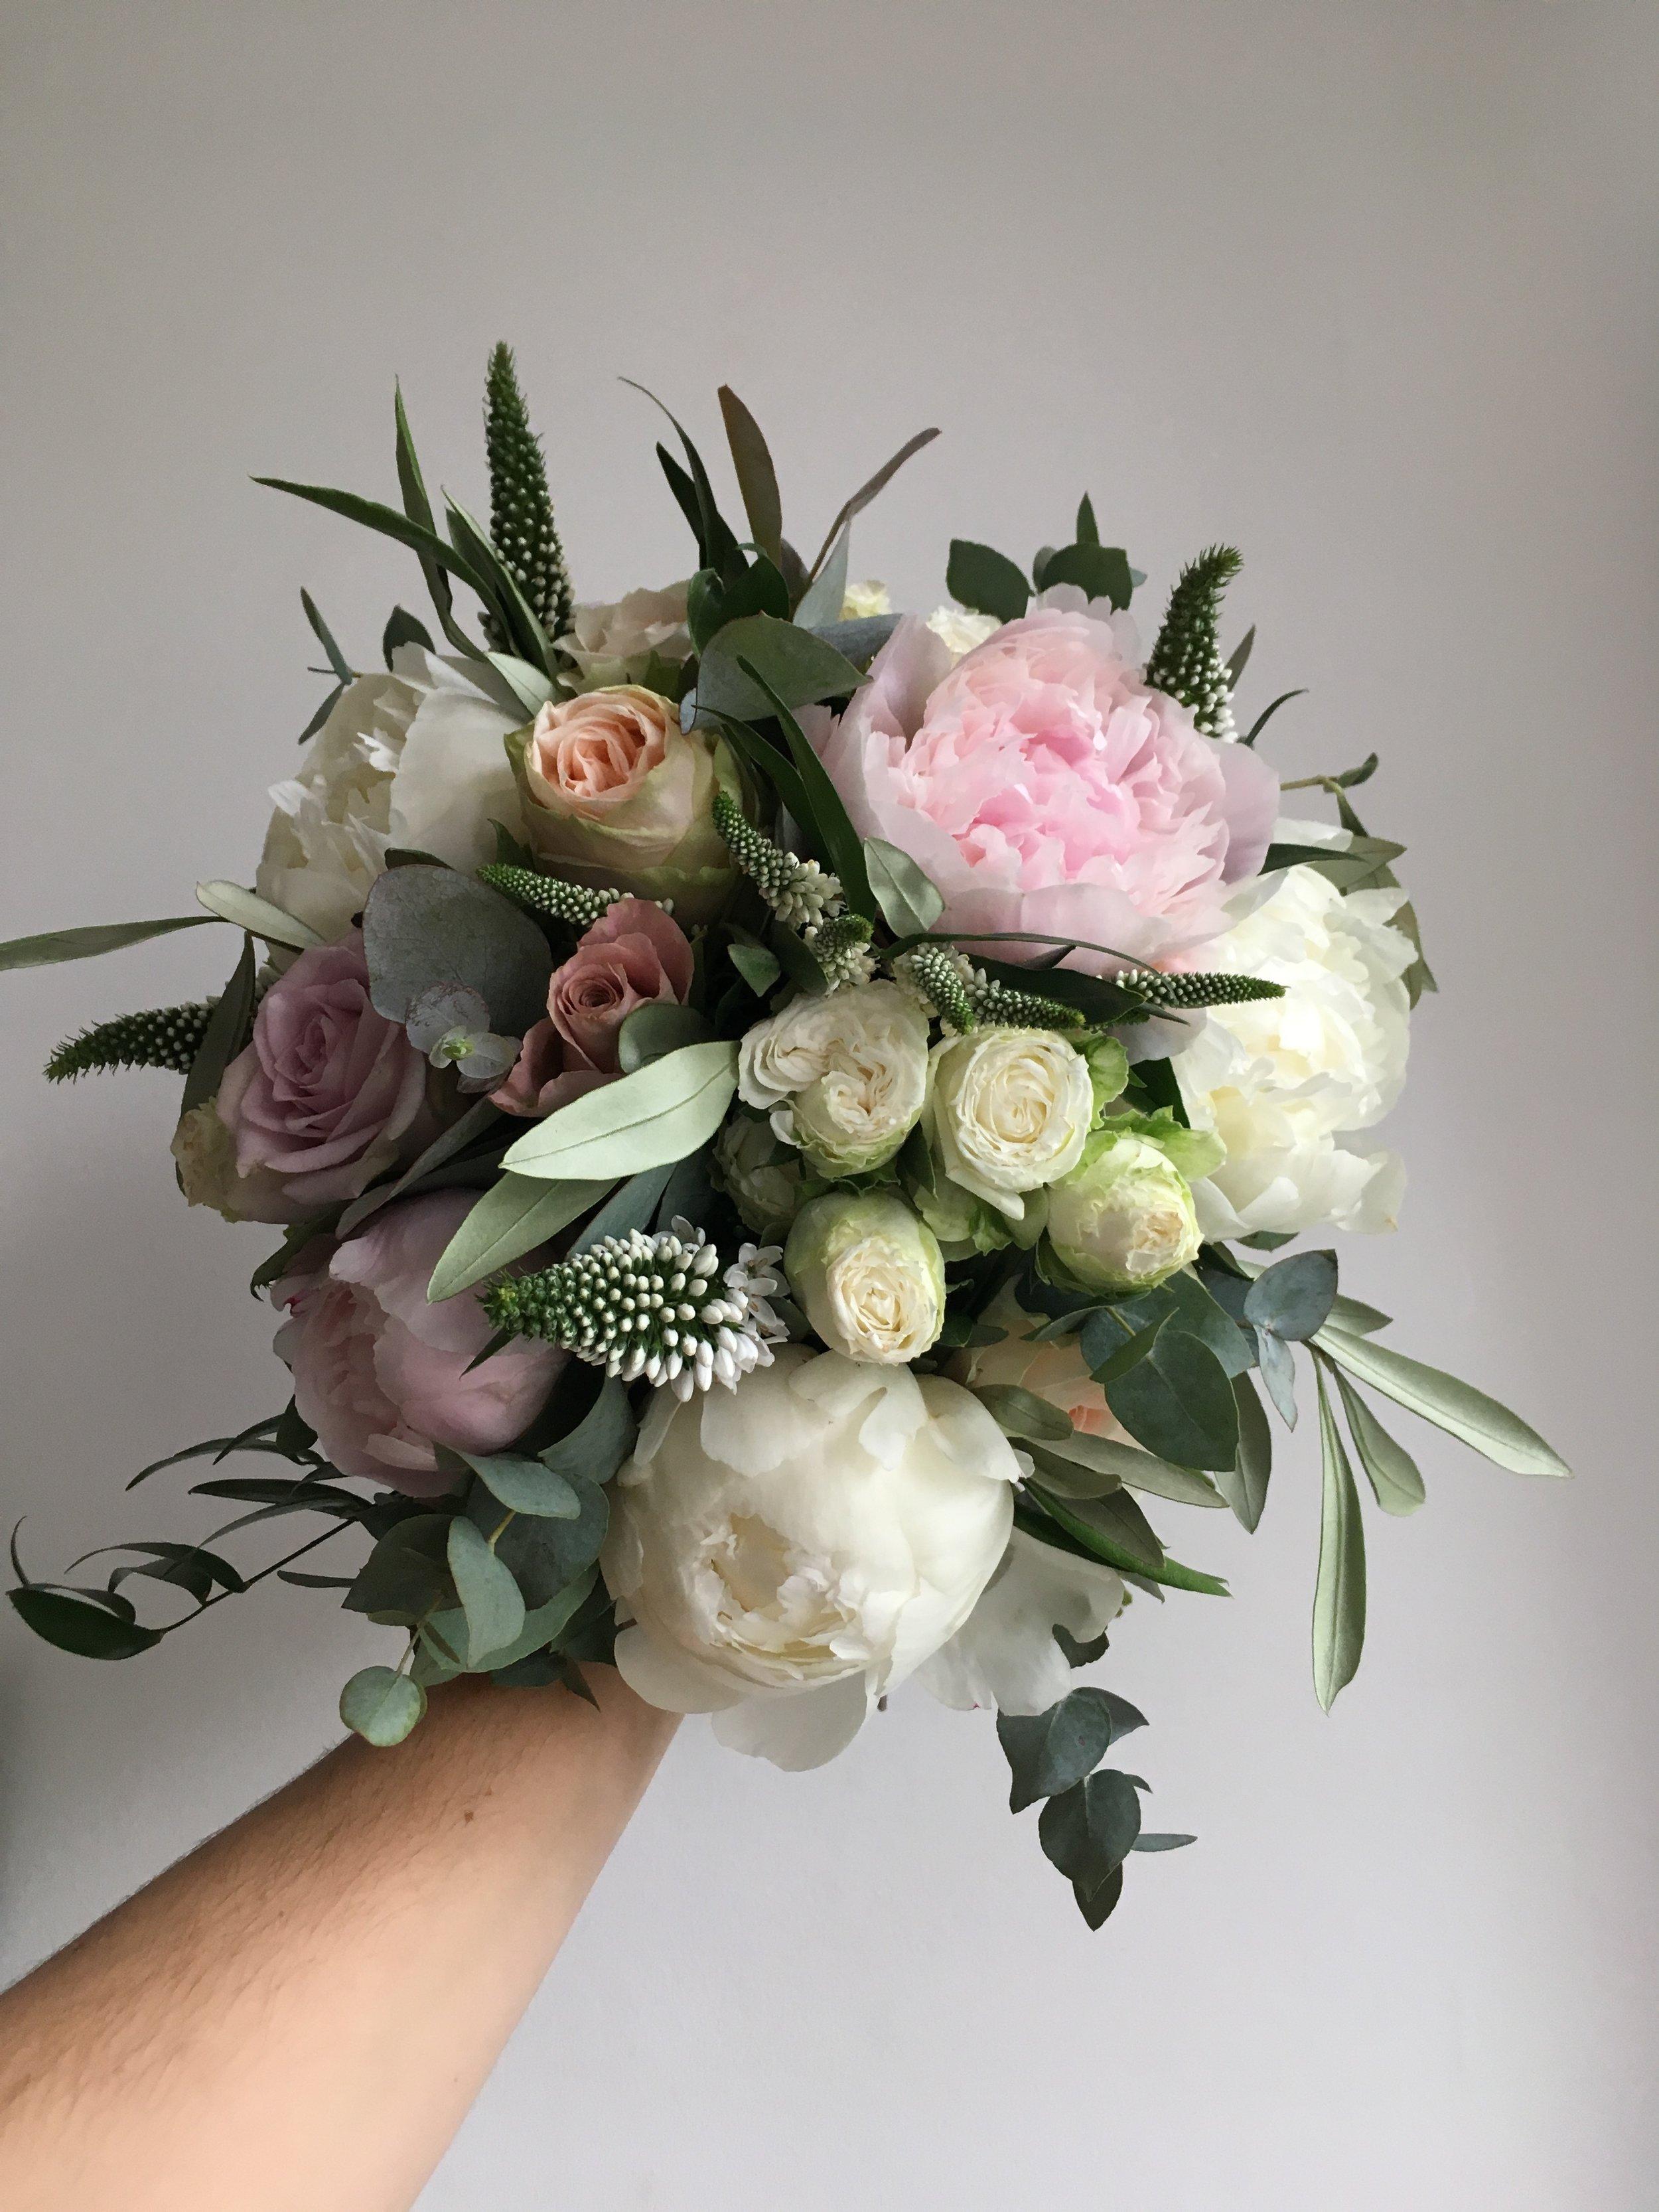 Wedding-Flowers-Brighton-Sussex-Florist-Bridal-Webb-and-Farrer (5).JPG